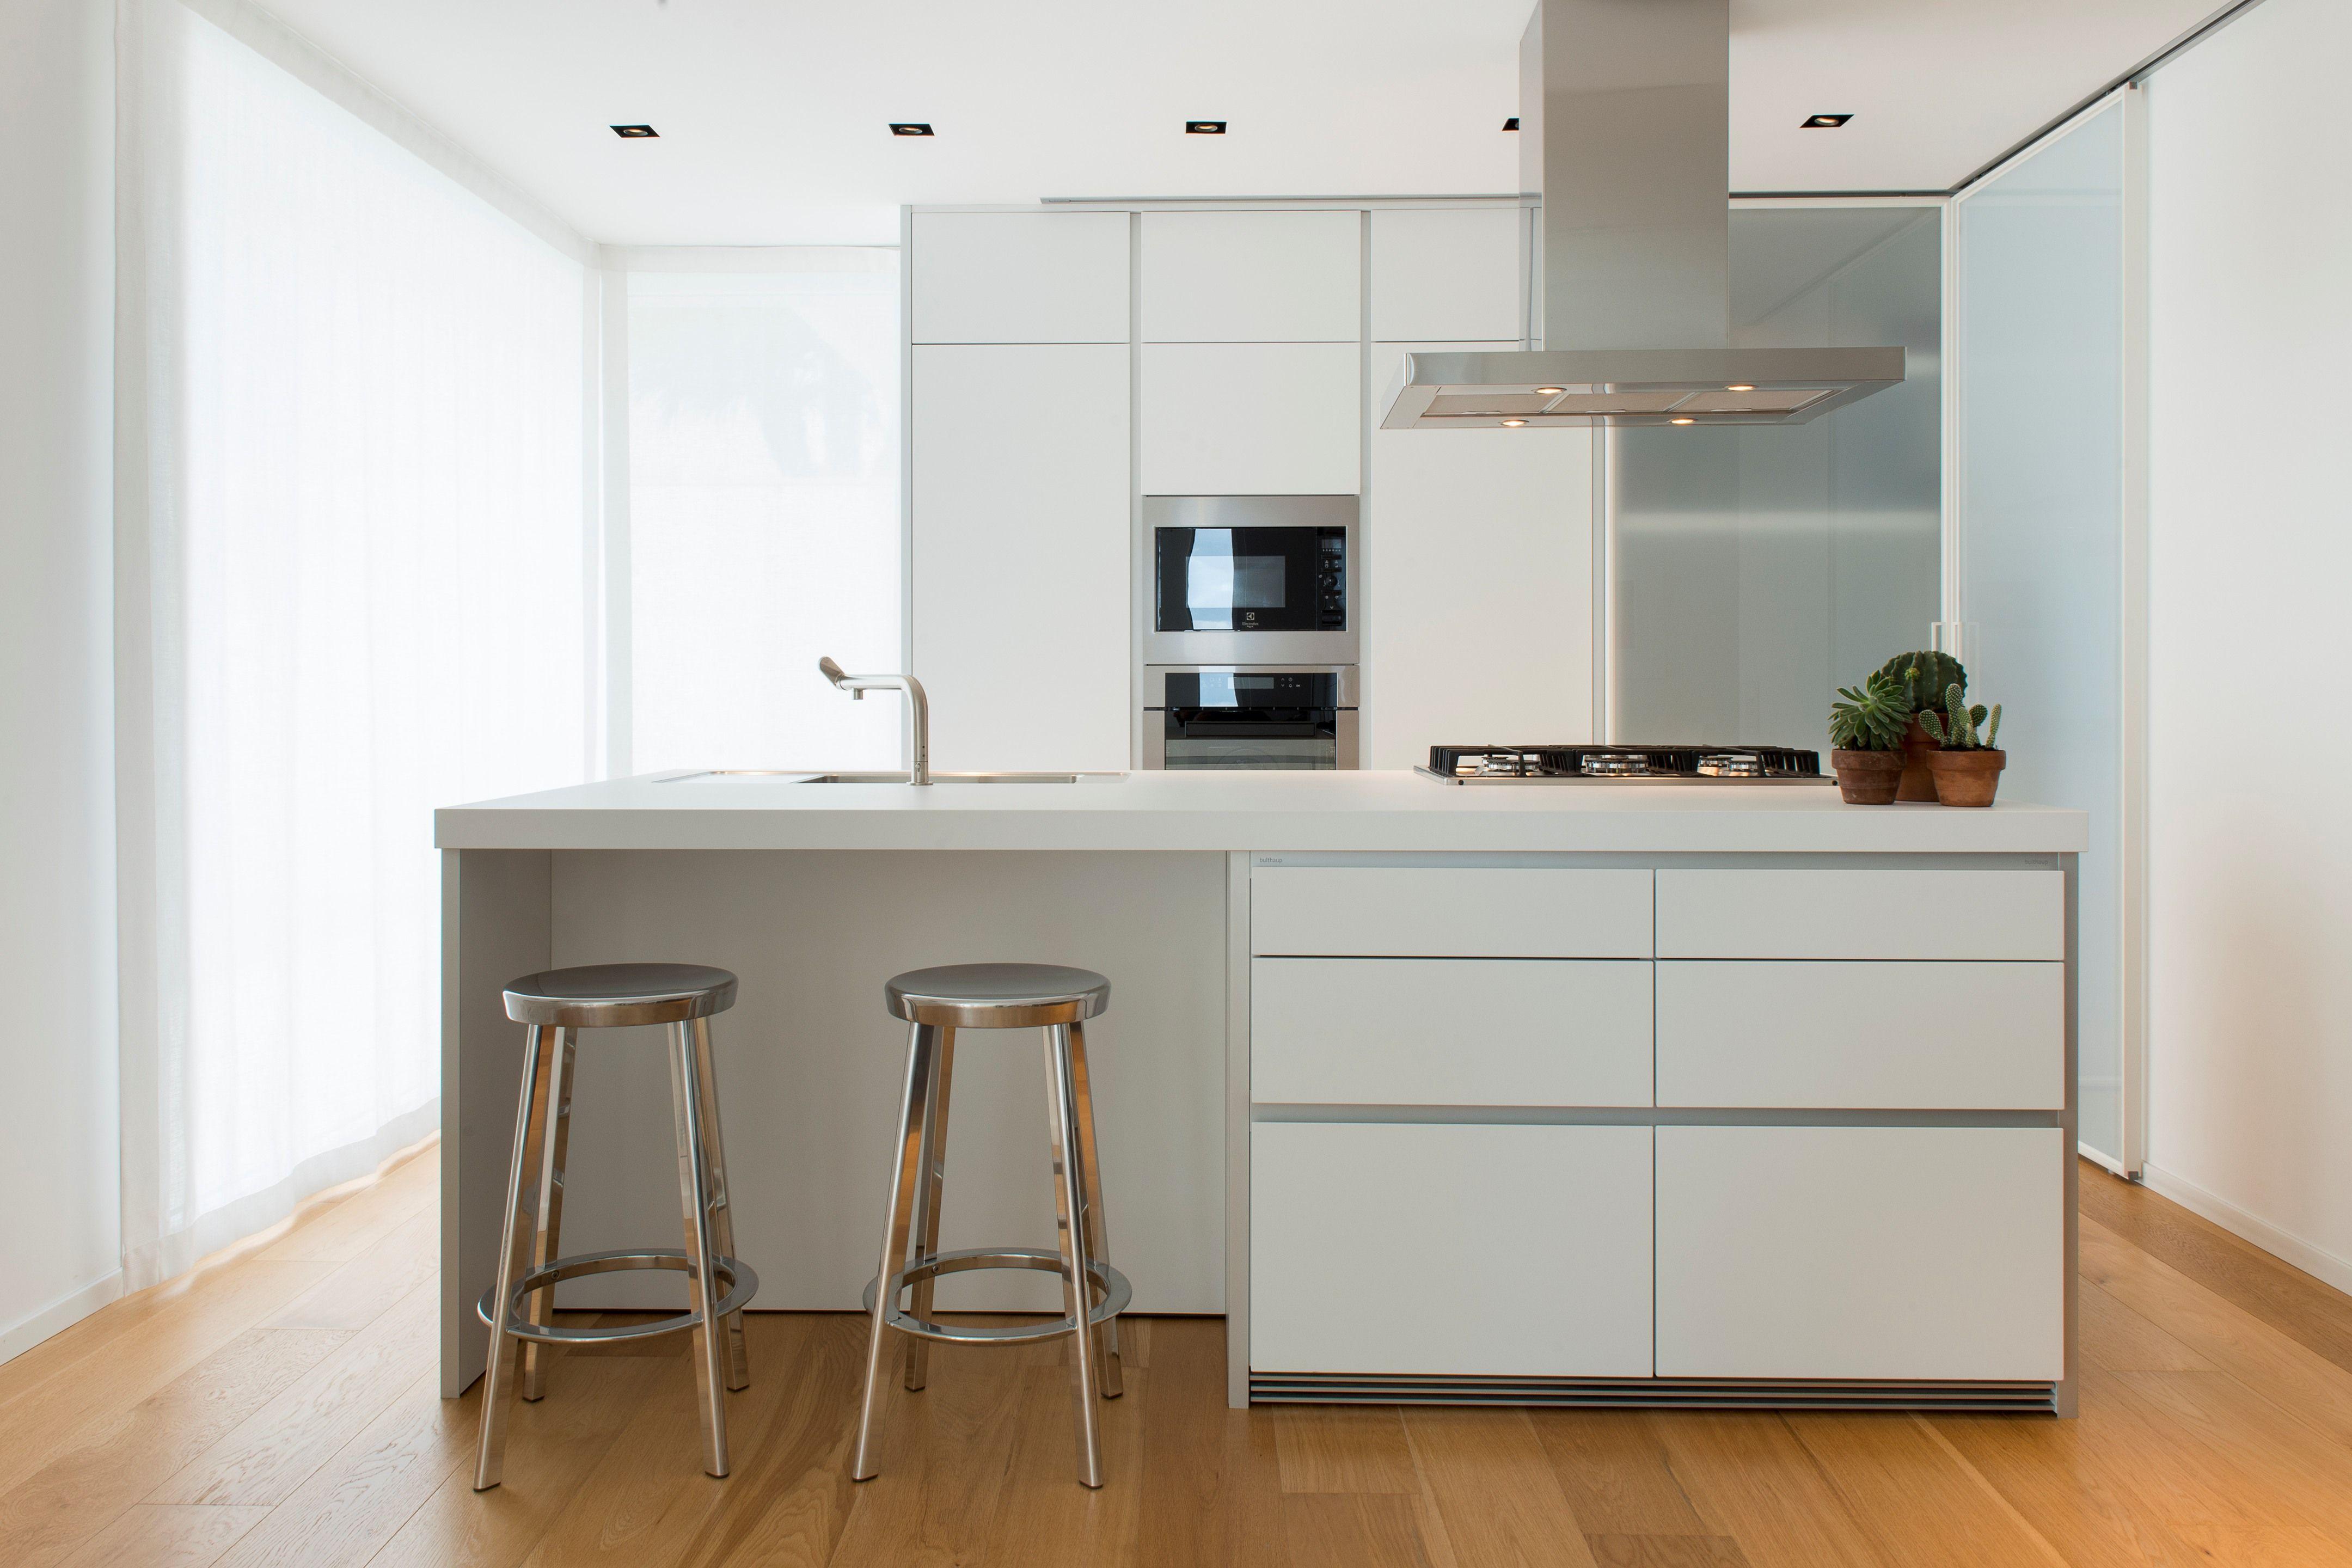 Bulthaup B1 Picture Gallery In 2020 Home Decor Kitchen Kitchen Interior Home Kitchens